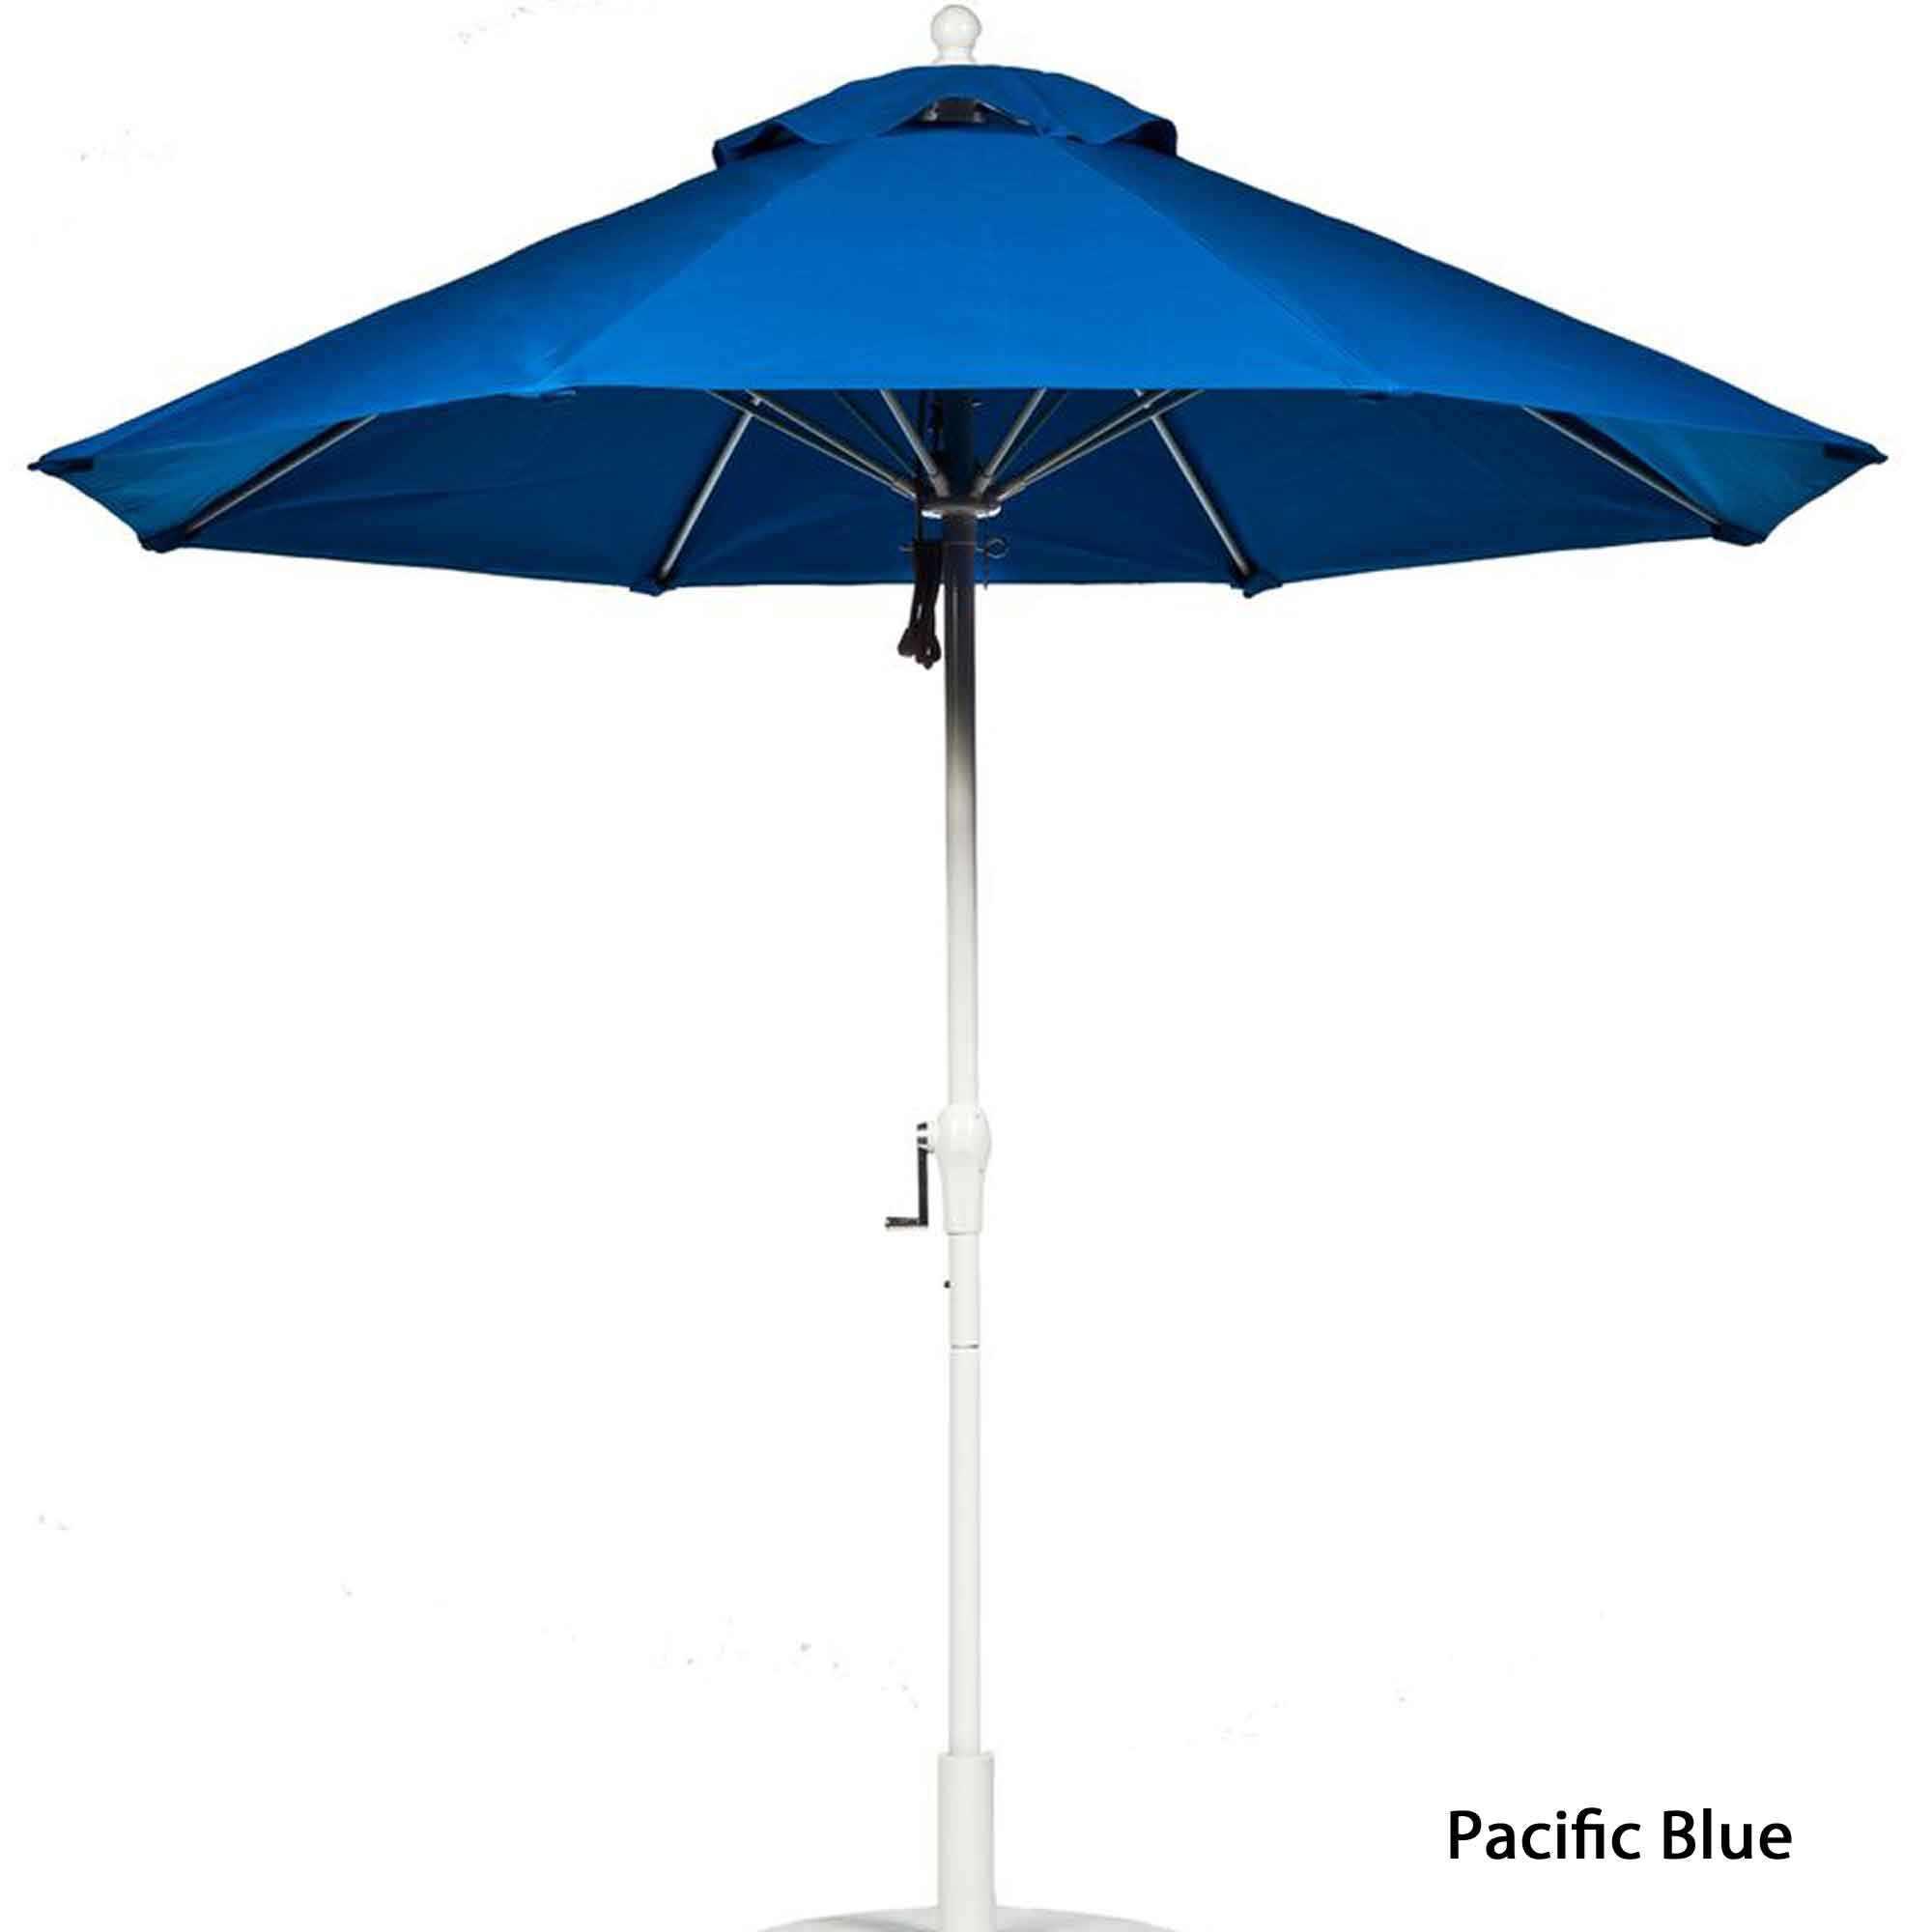 7 FT Patio Umbrella Blue With White Pole